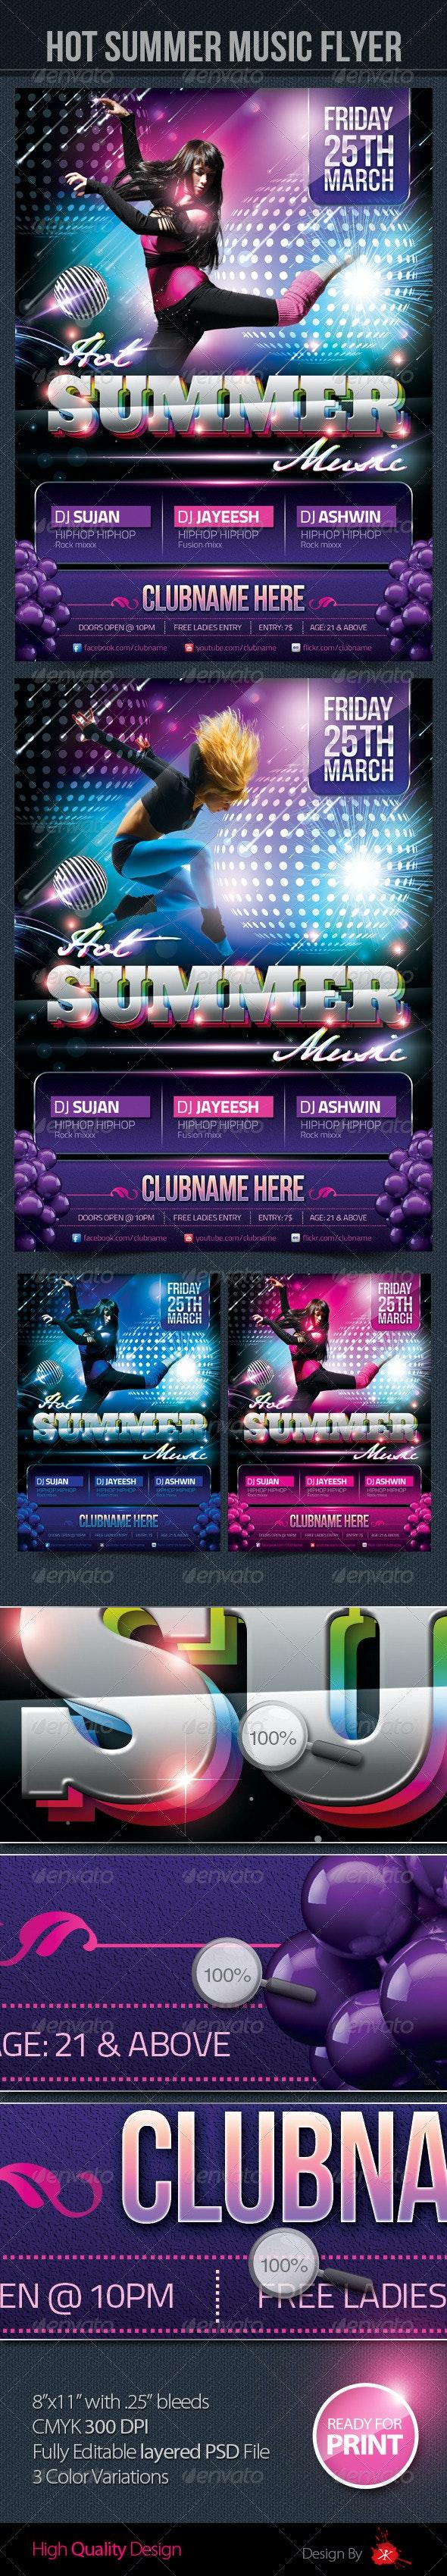 Hot Summer Music Flyer - Clubs & Parties Events